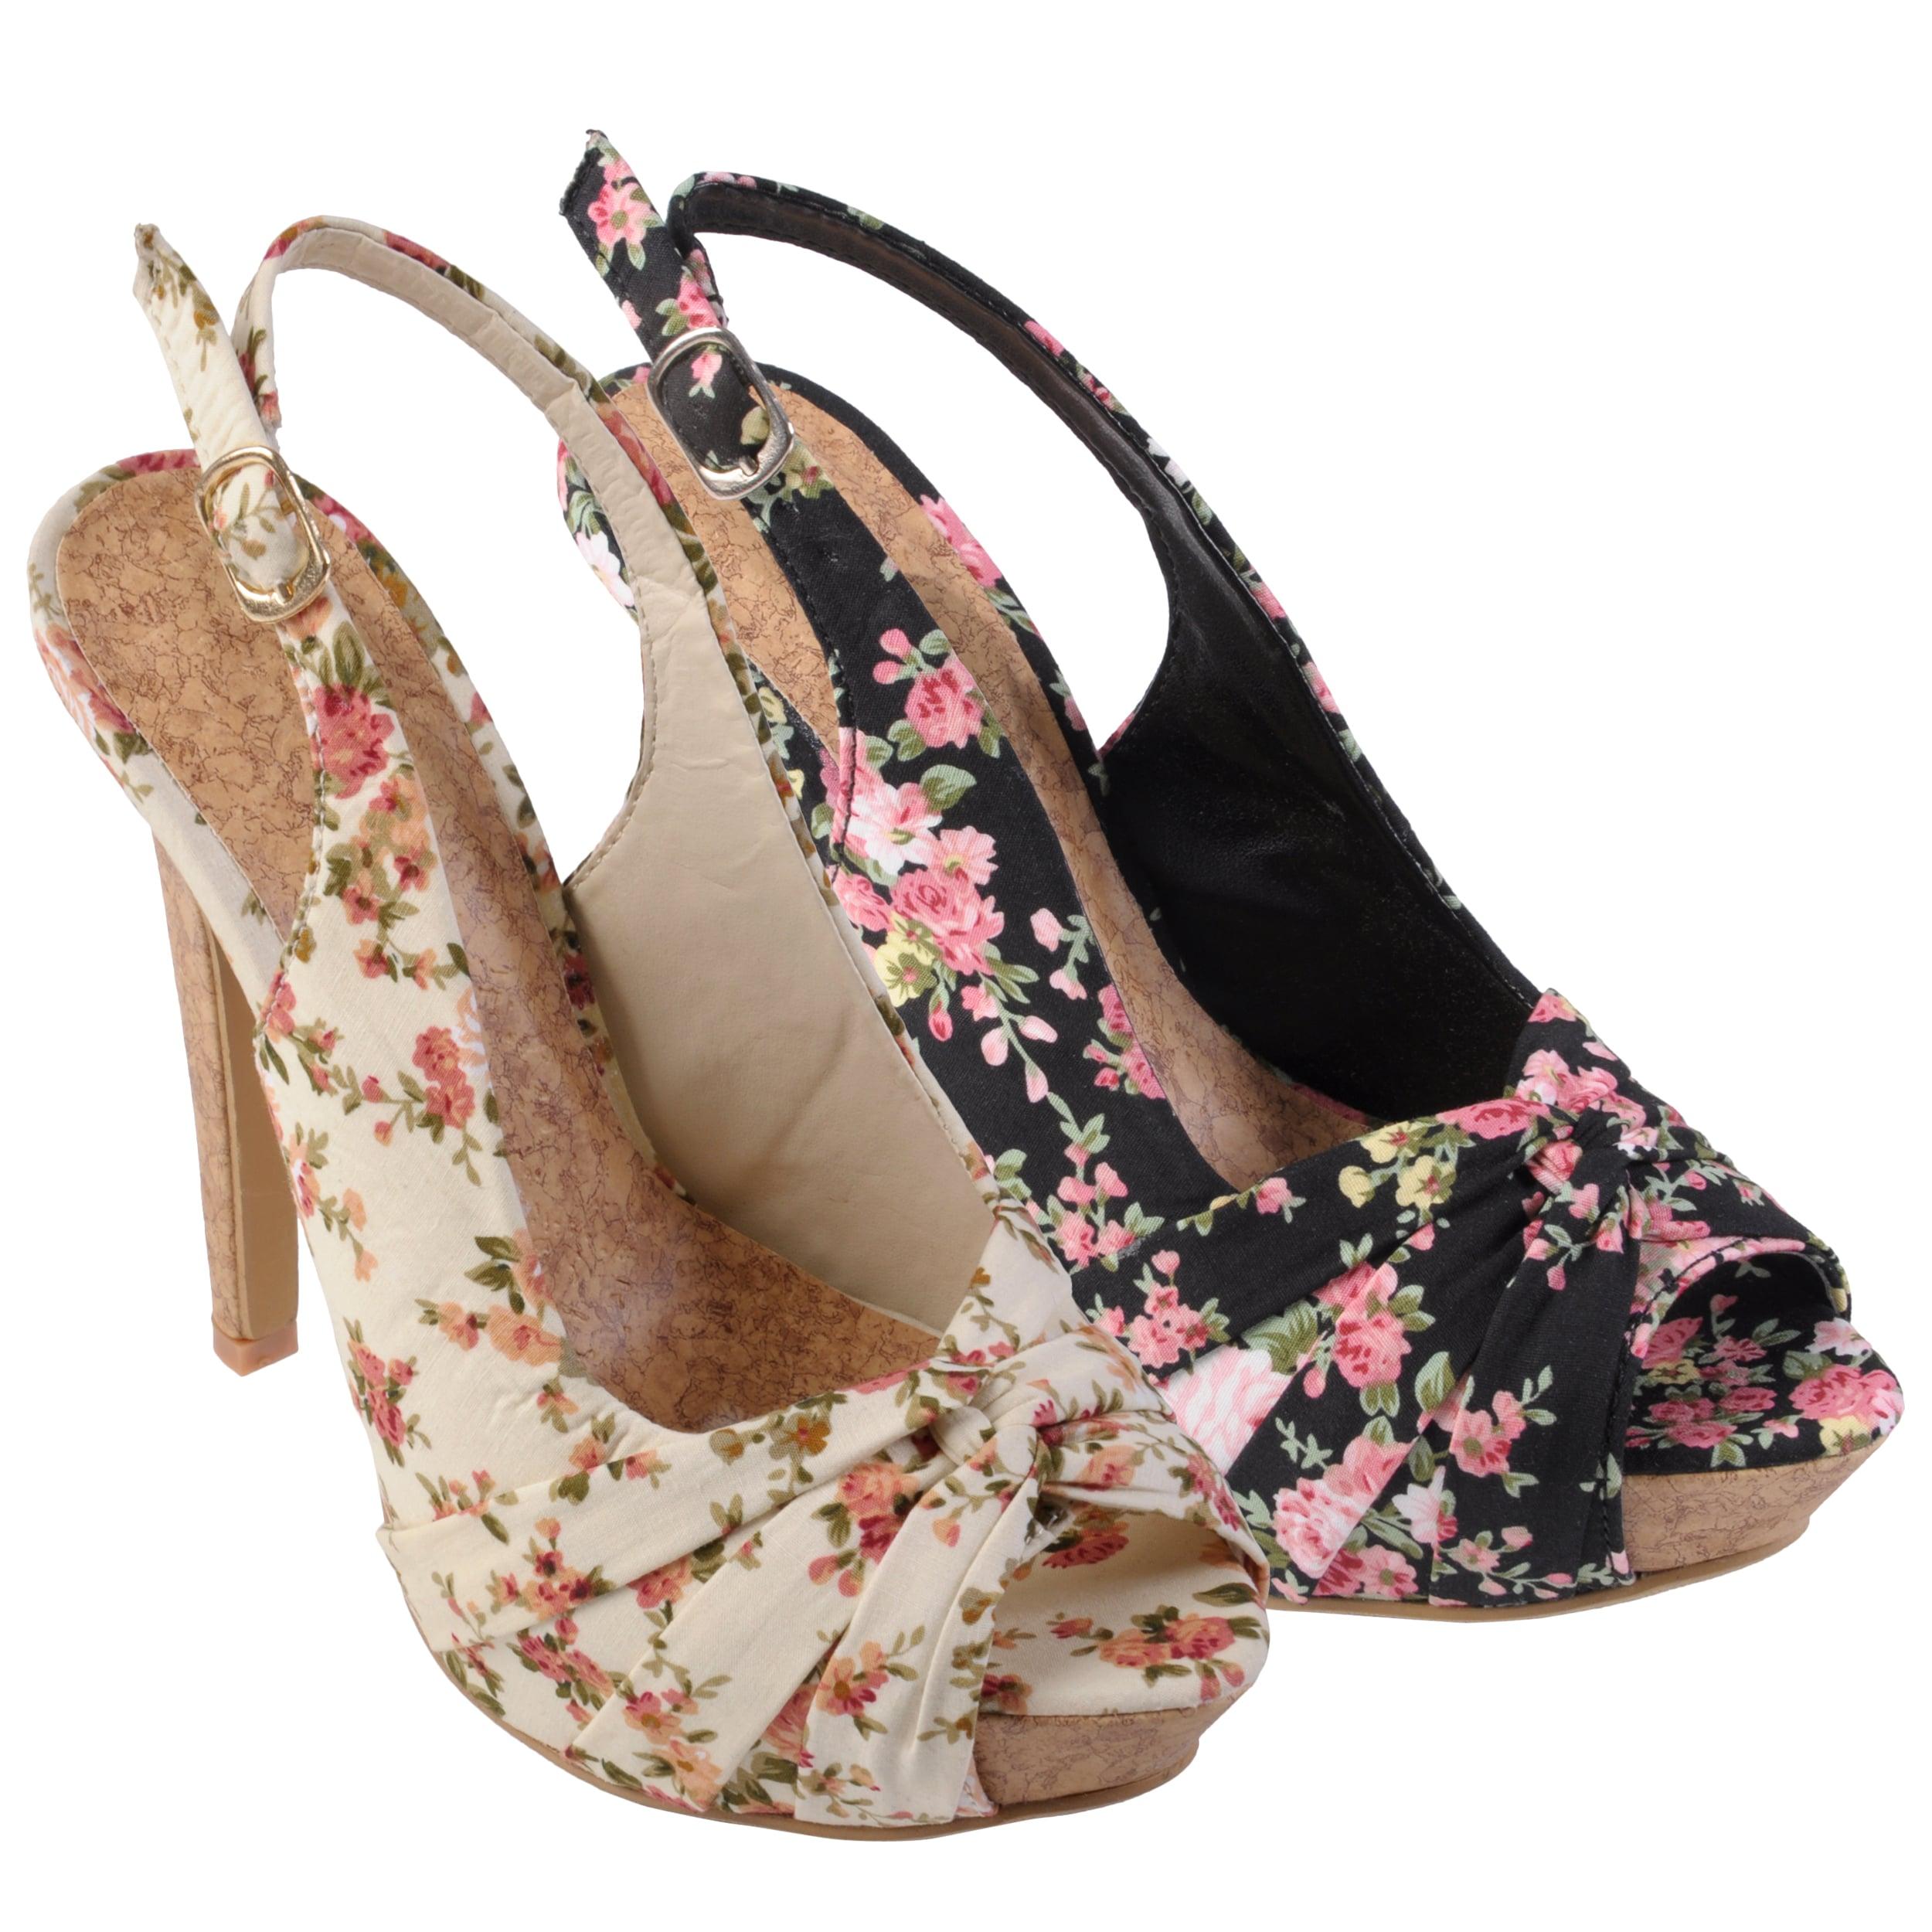 Journee Collection Women's 'Blythe-2' Floral Peep Toe Slingback Pumps